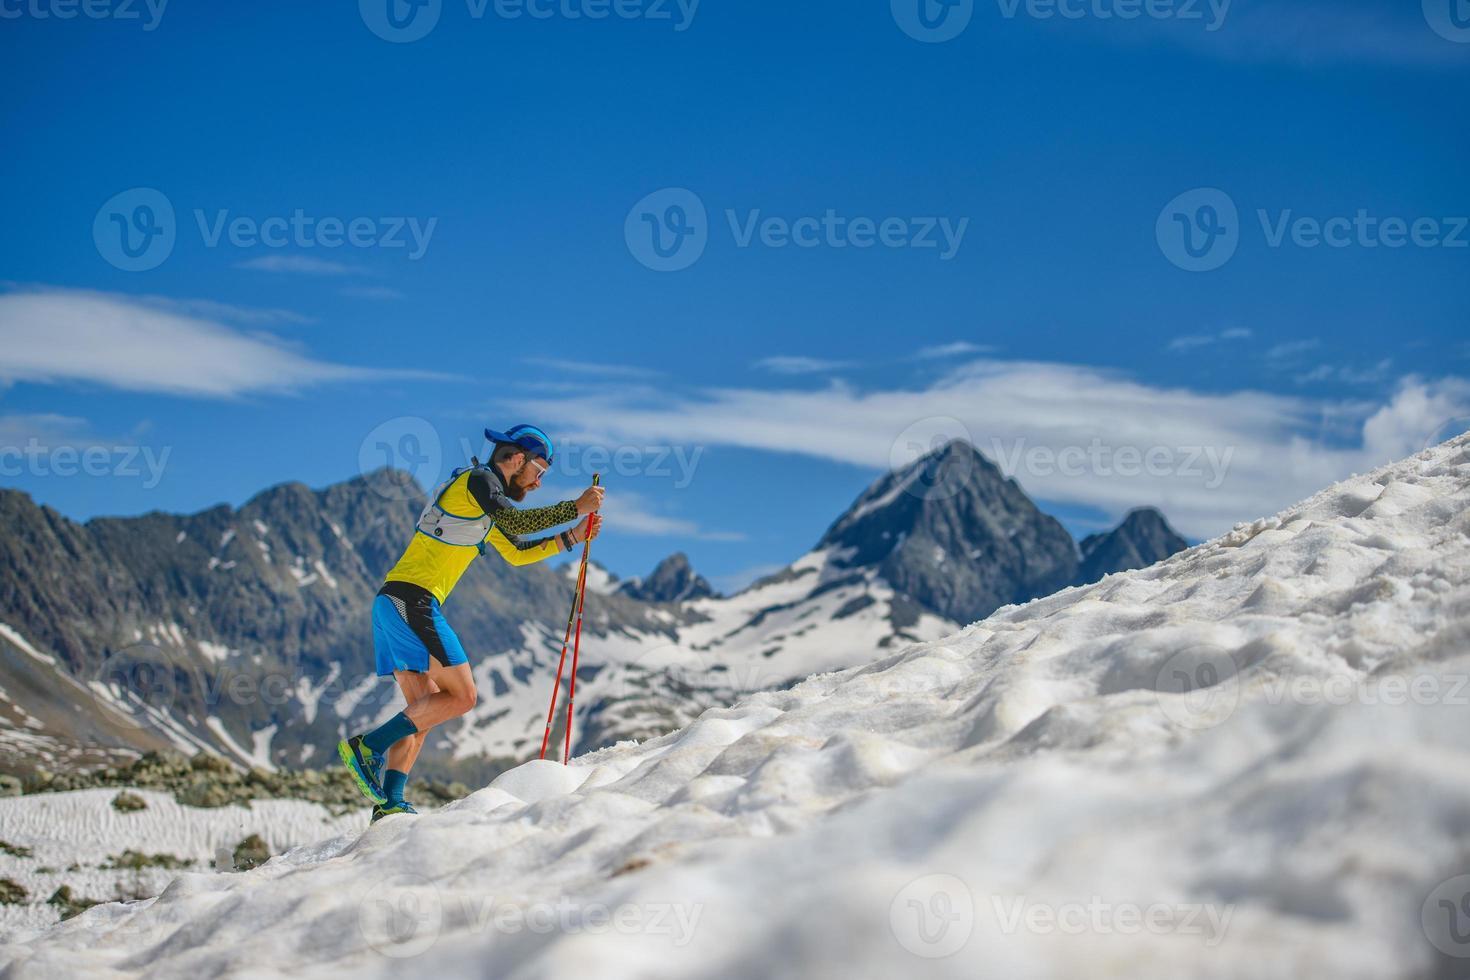 Skyrunning training with sticks on the snow uphill photo